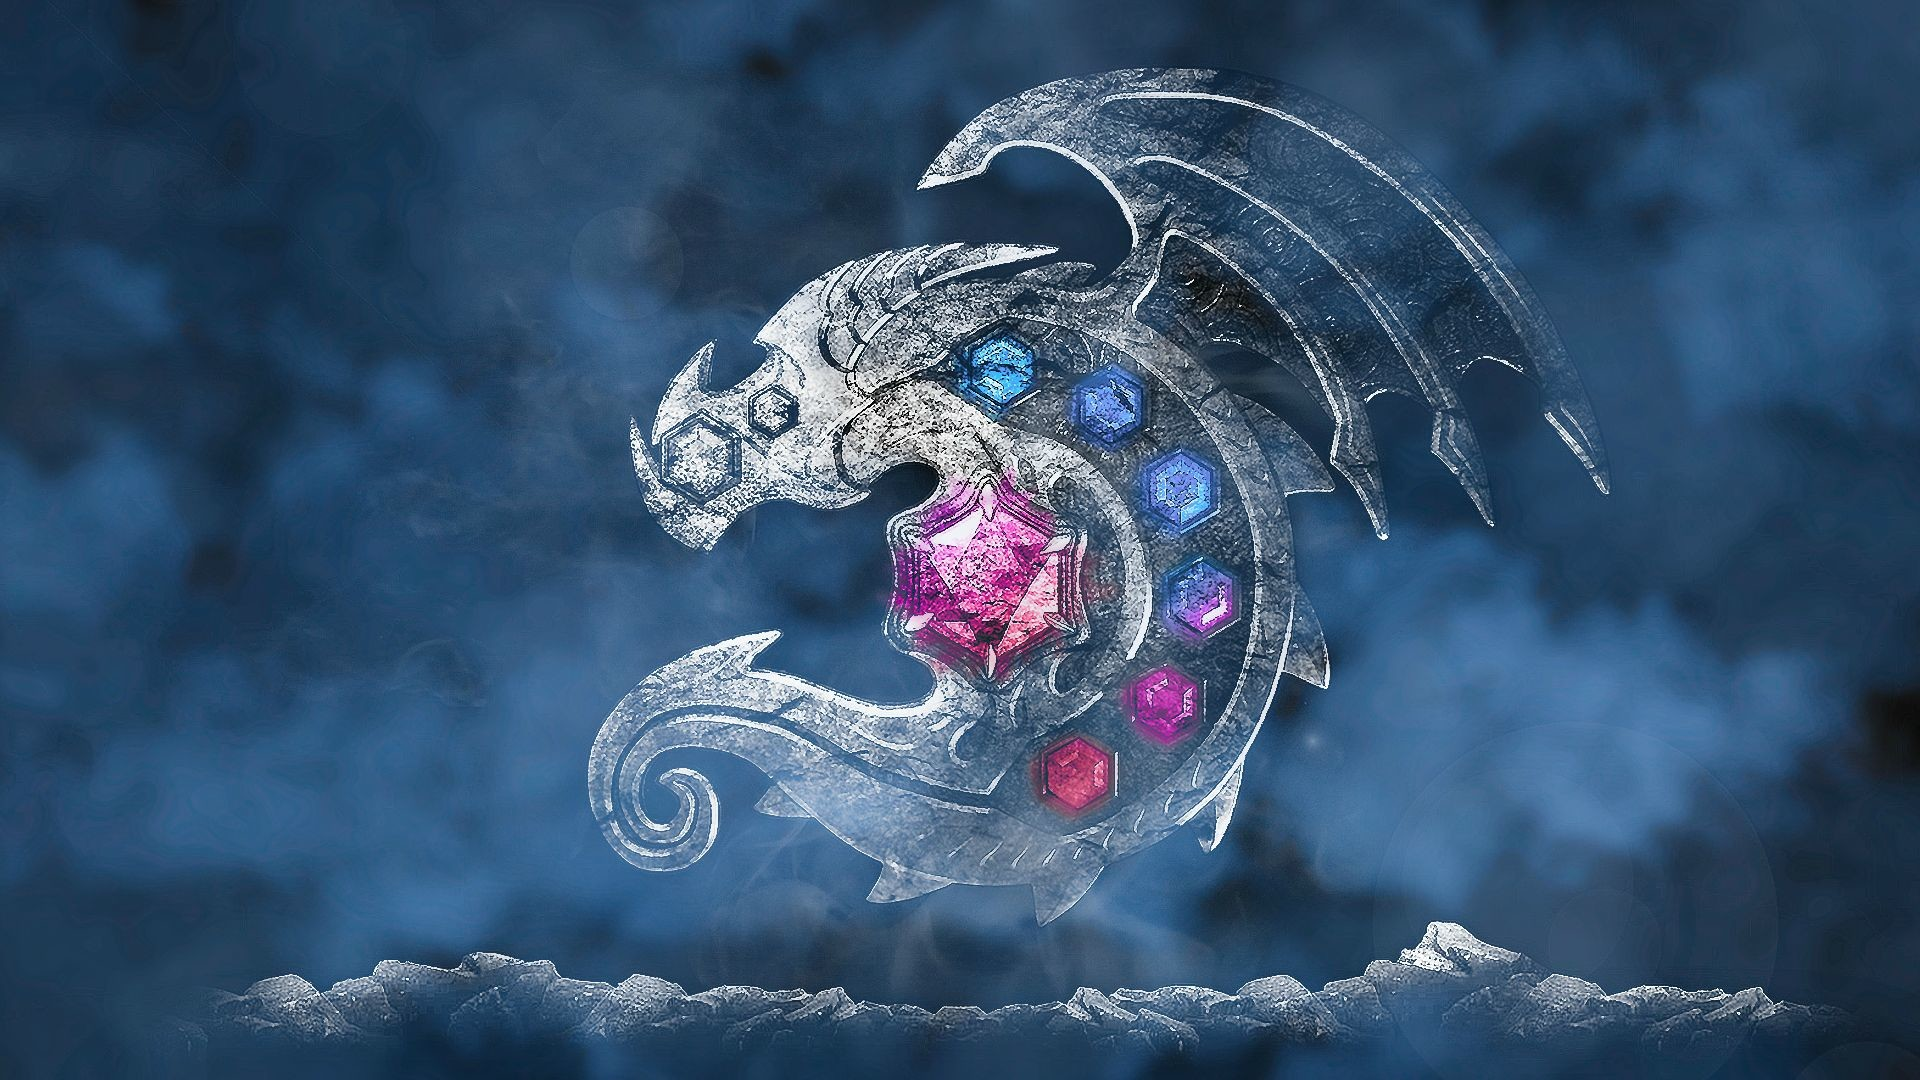 dragon nest wallpaper 59 images